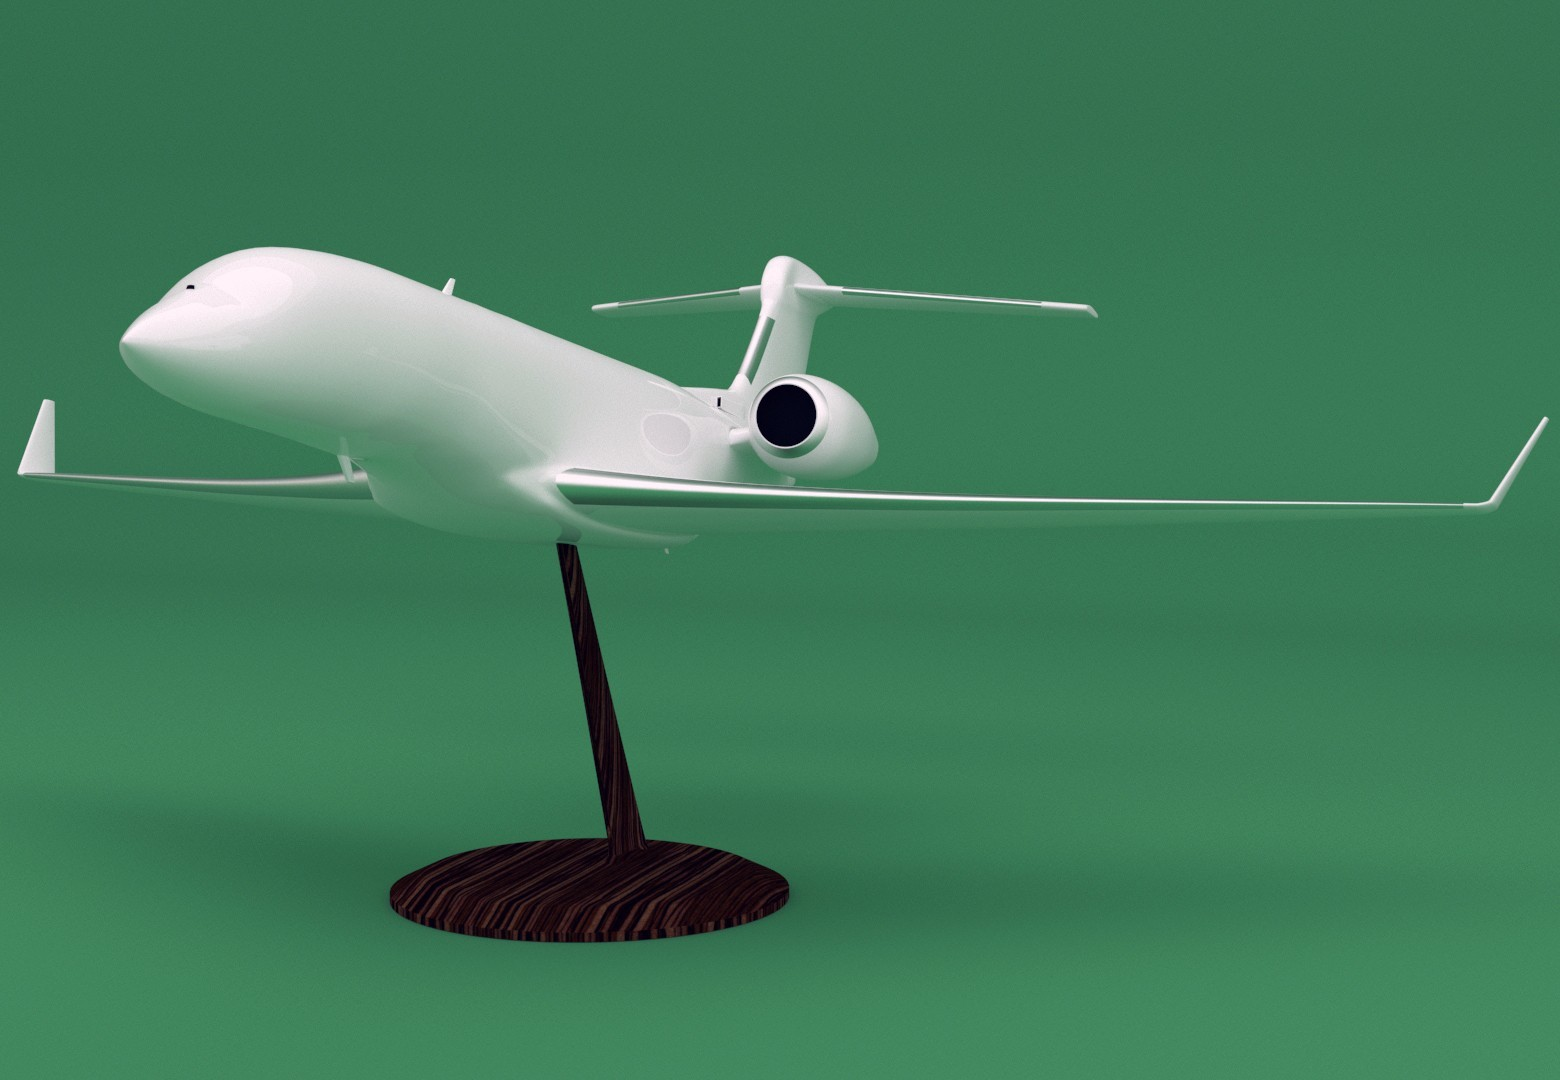 G650_2.jpg Download STL file Replica Gulfstream G650 3D print model • 3D print design, Eduardohbm